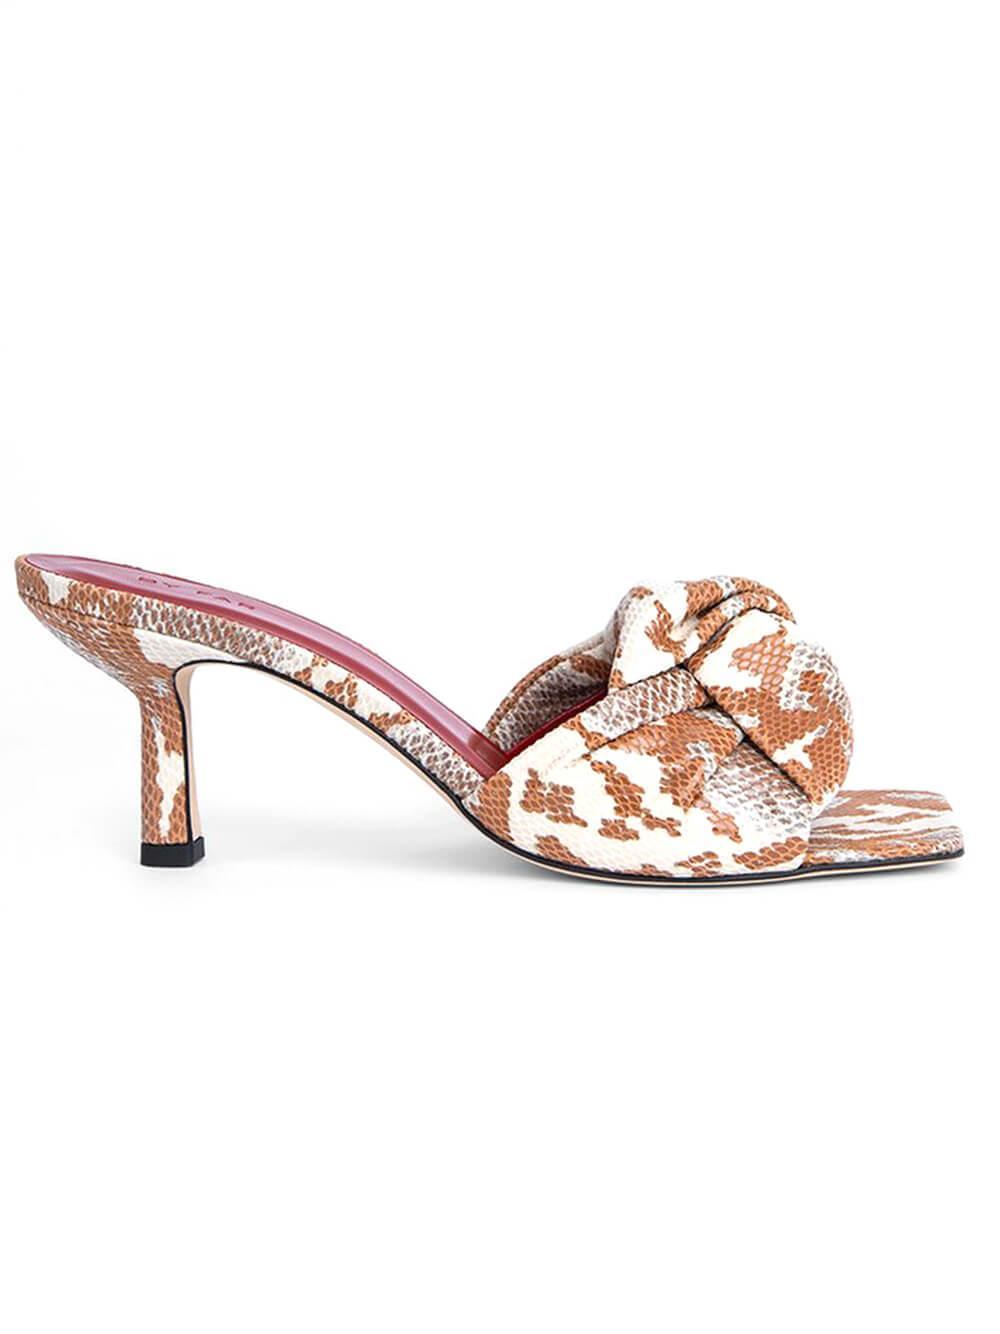 Lana Snake Print Sandal